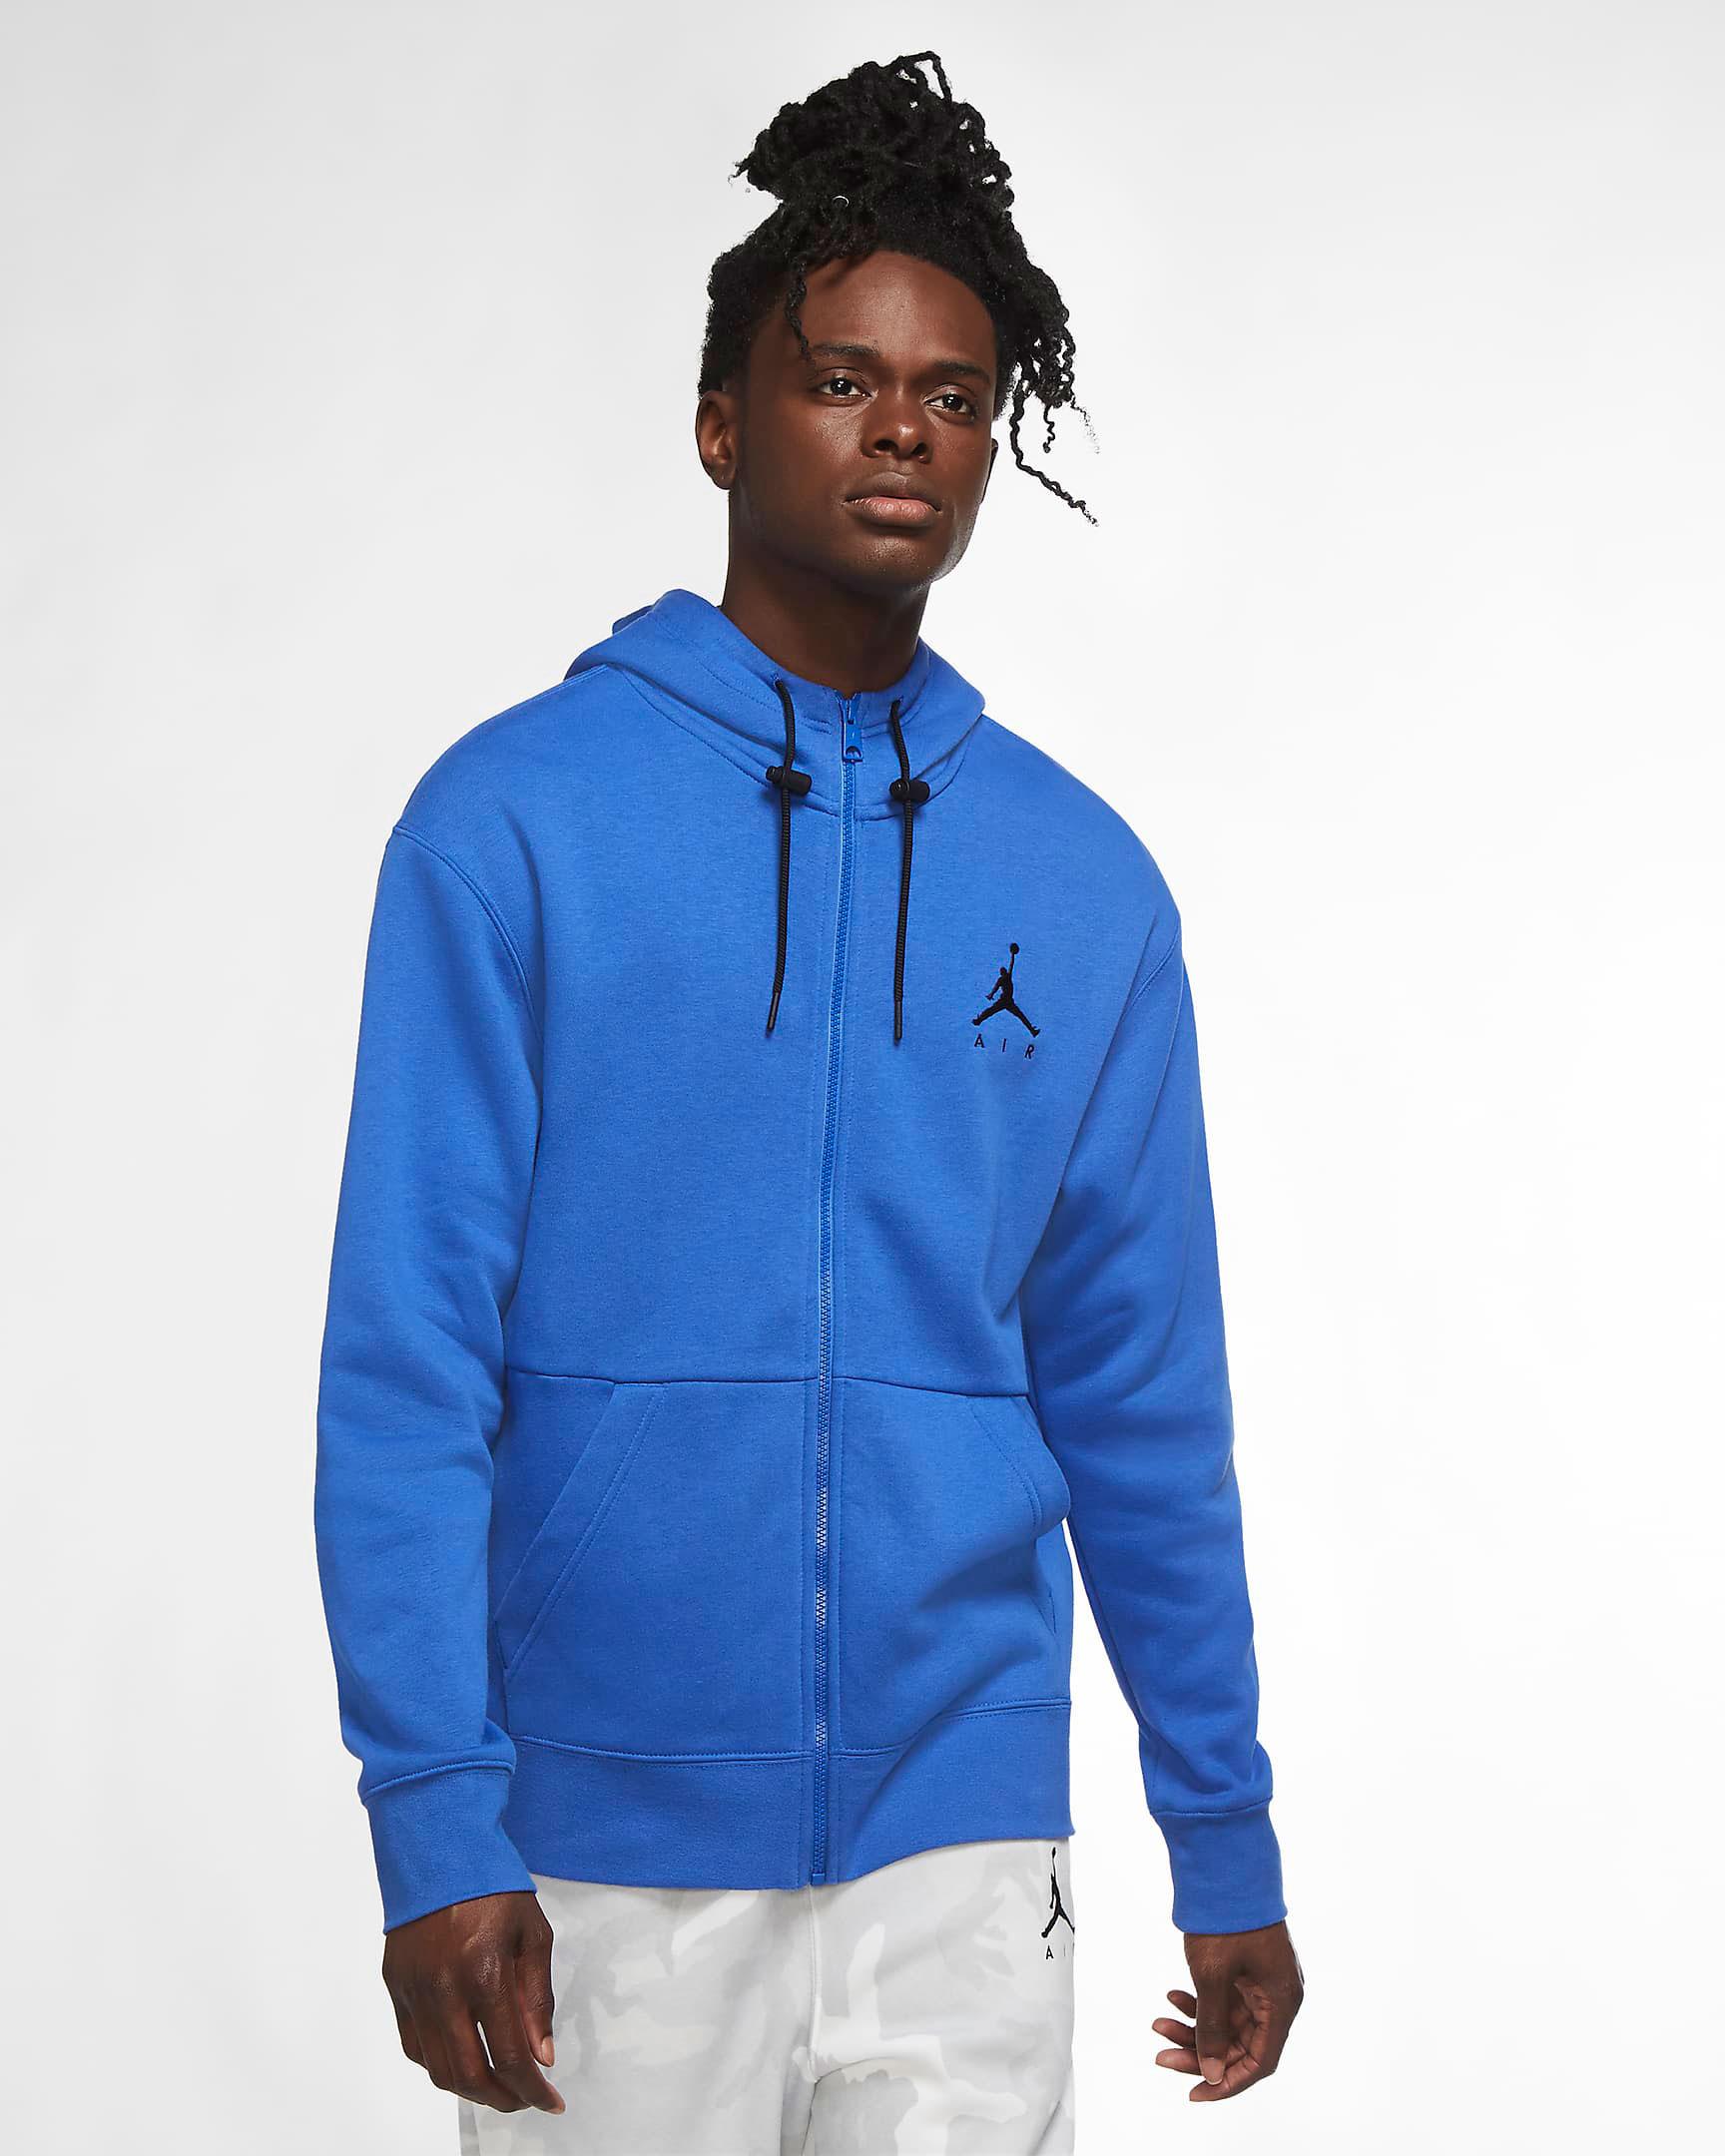 air-jordan-3-royal-blue-cement-matching-hoodie